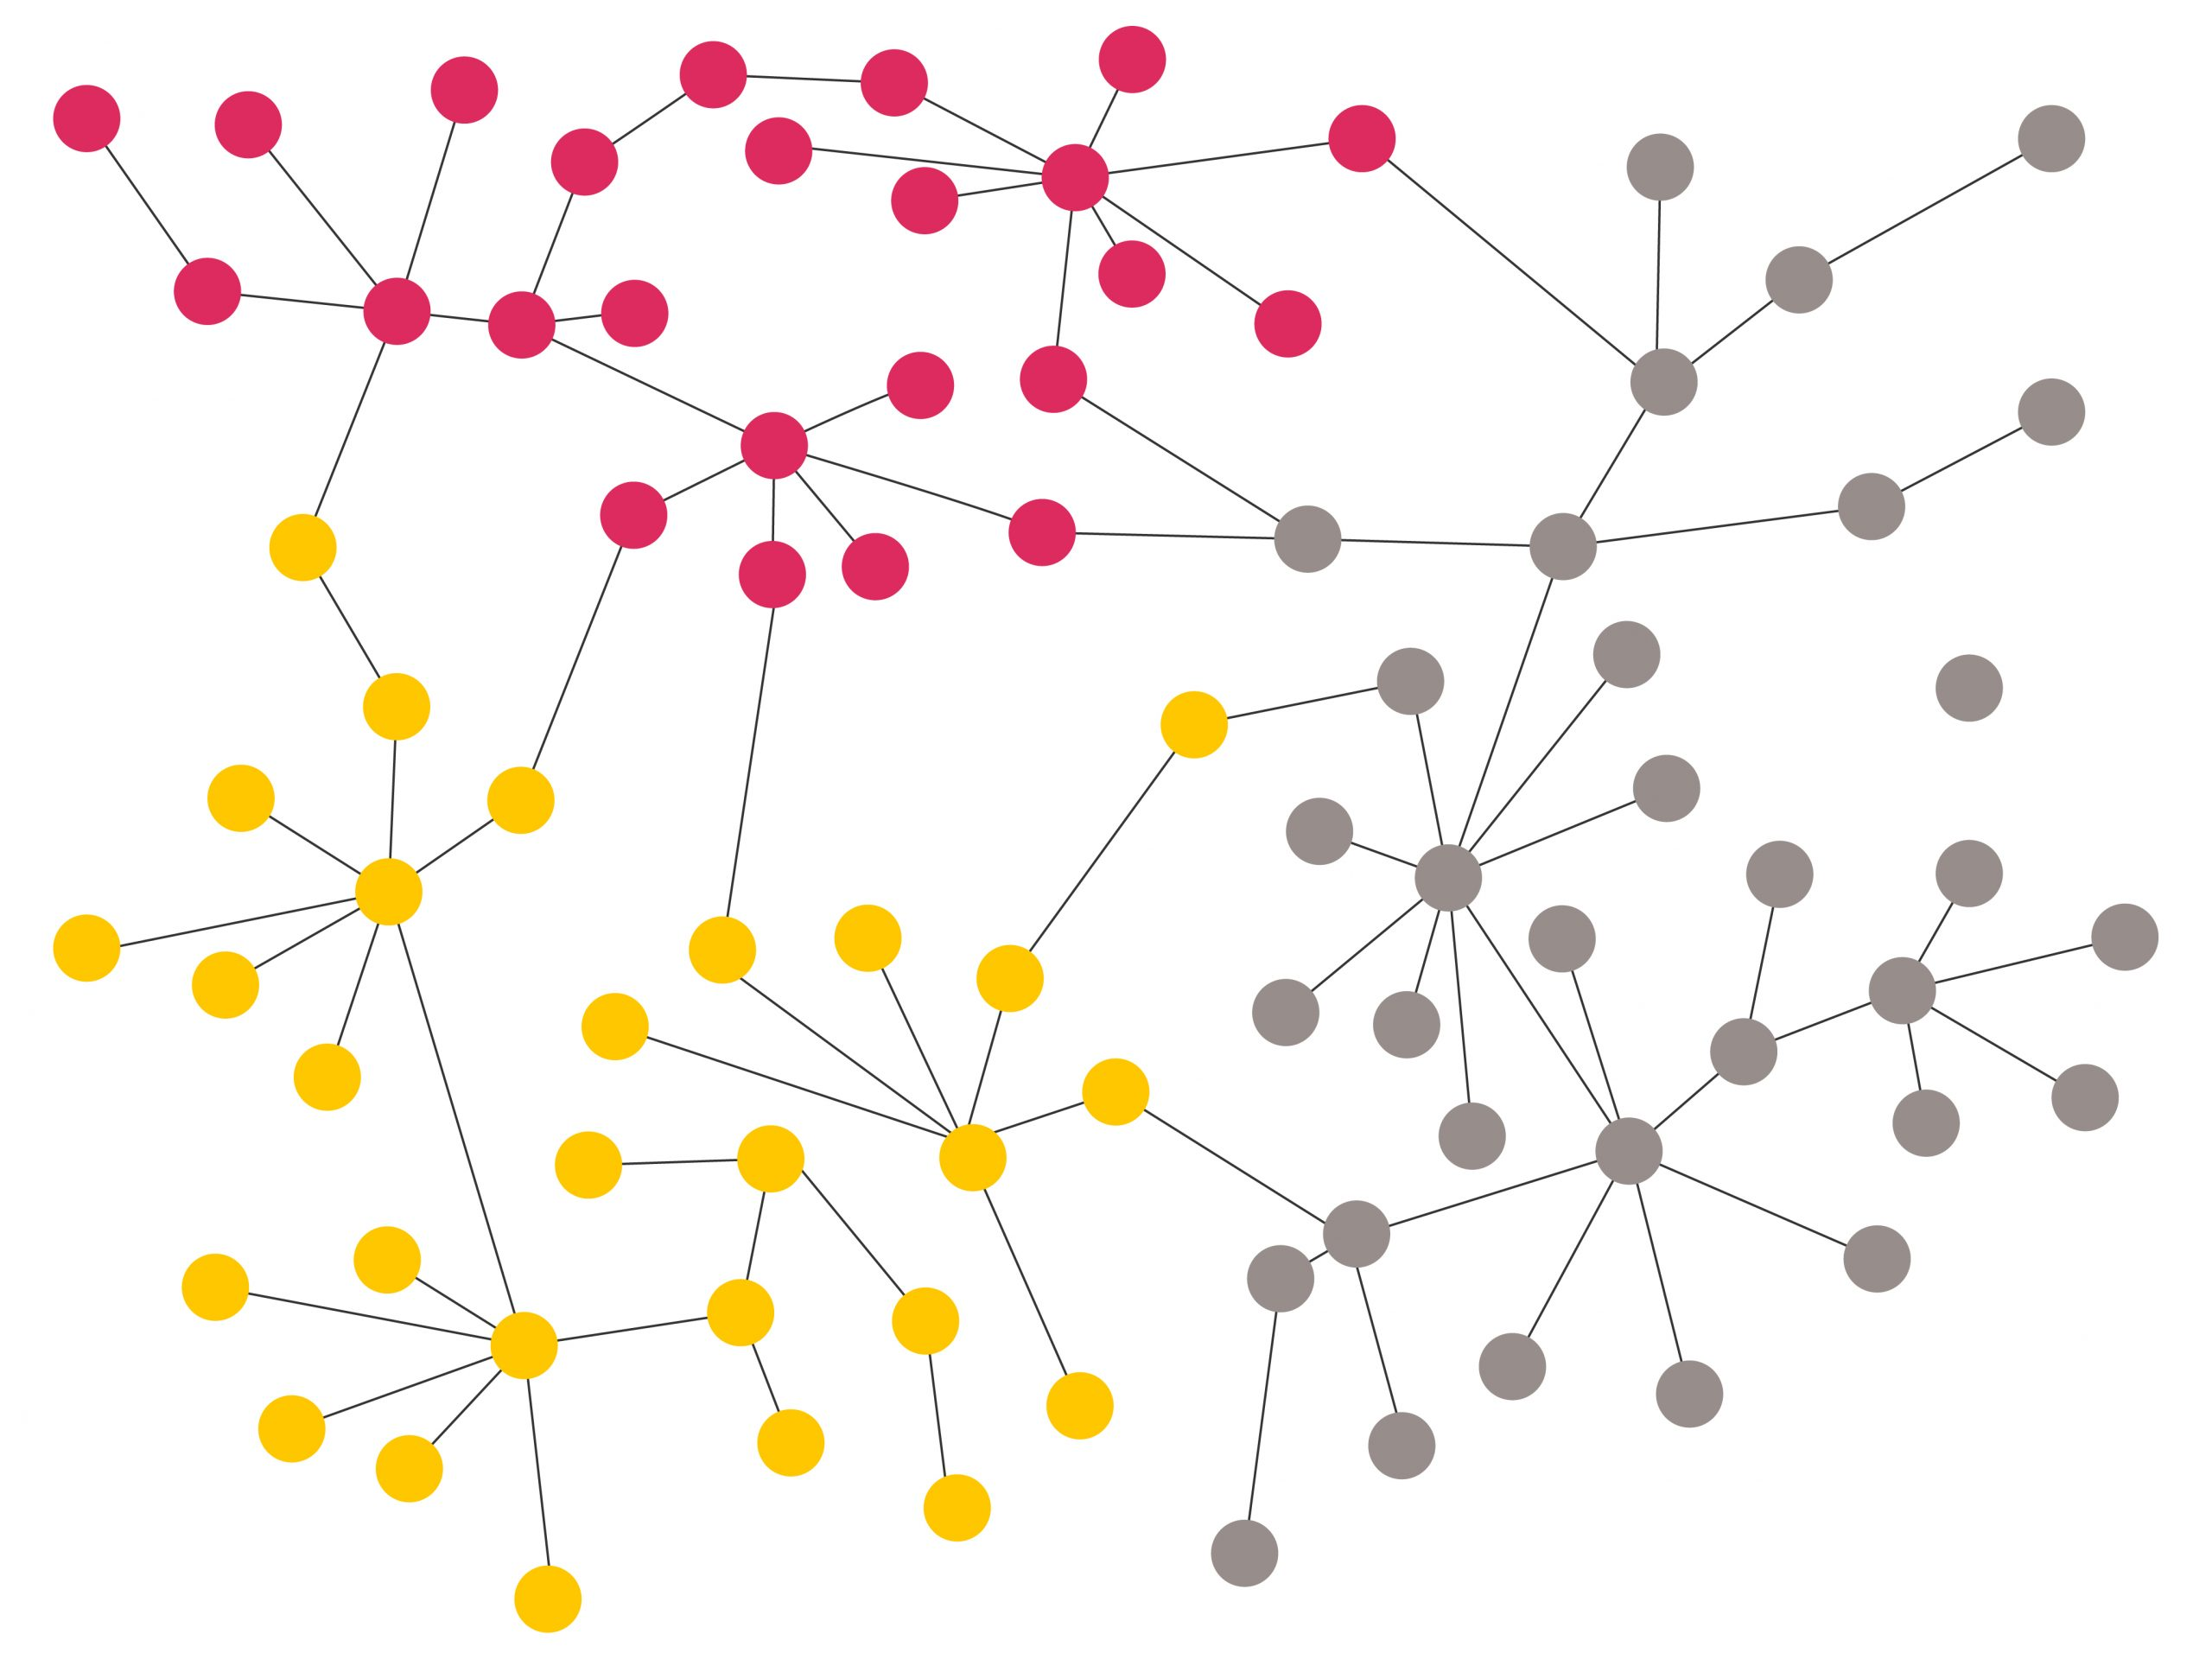 Network Nodes Visual